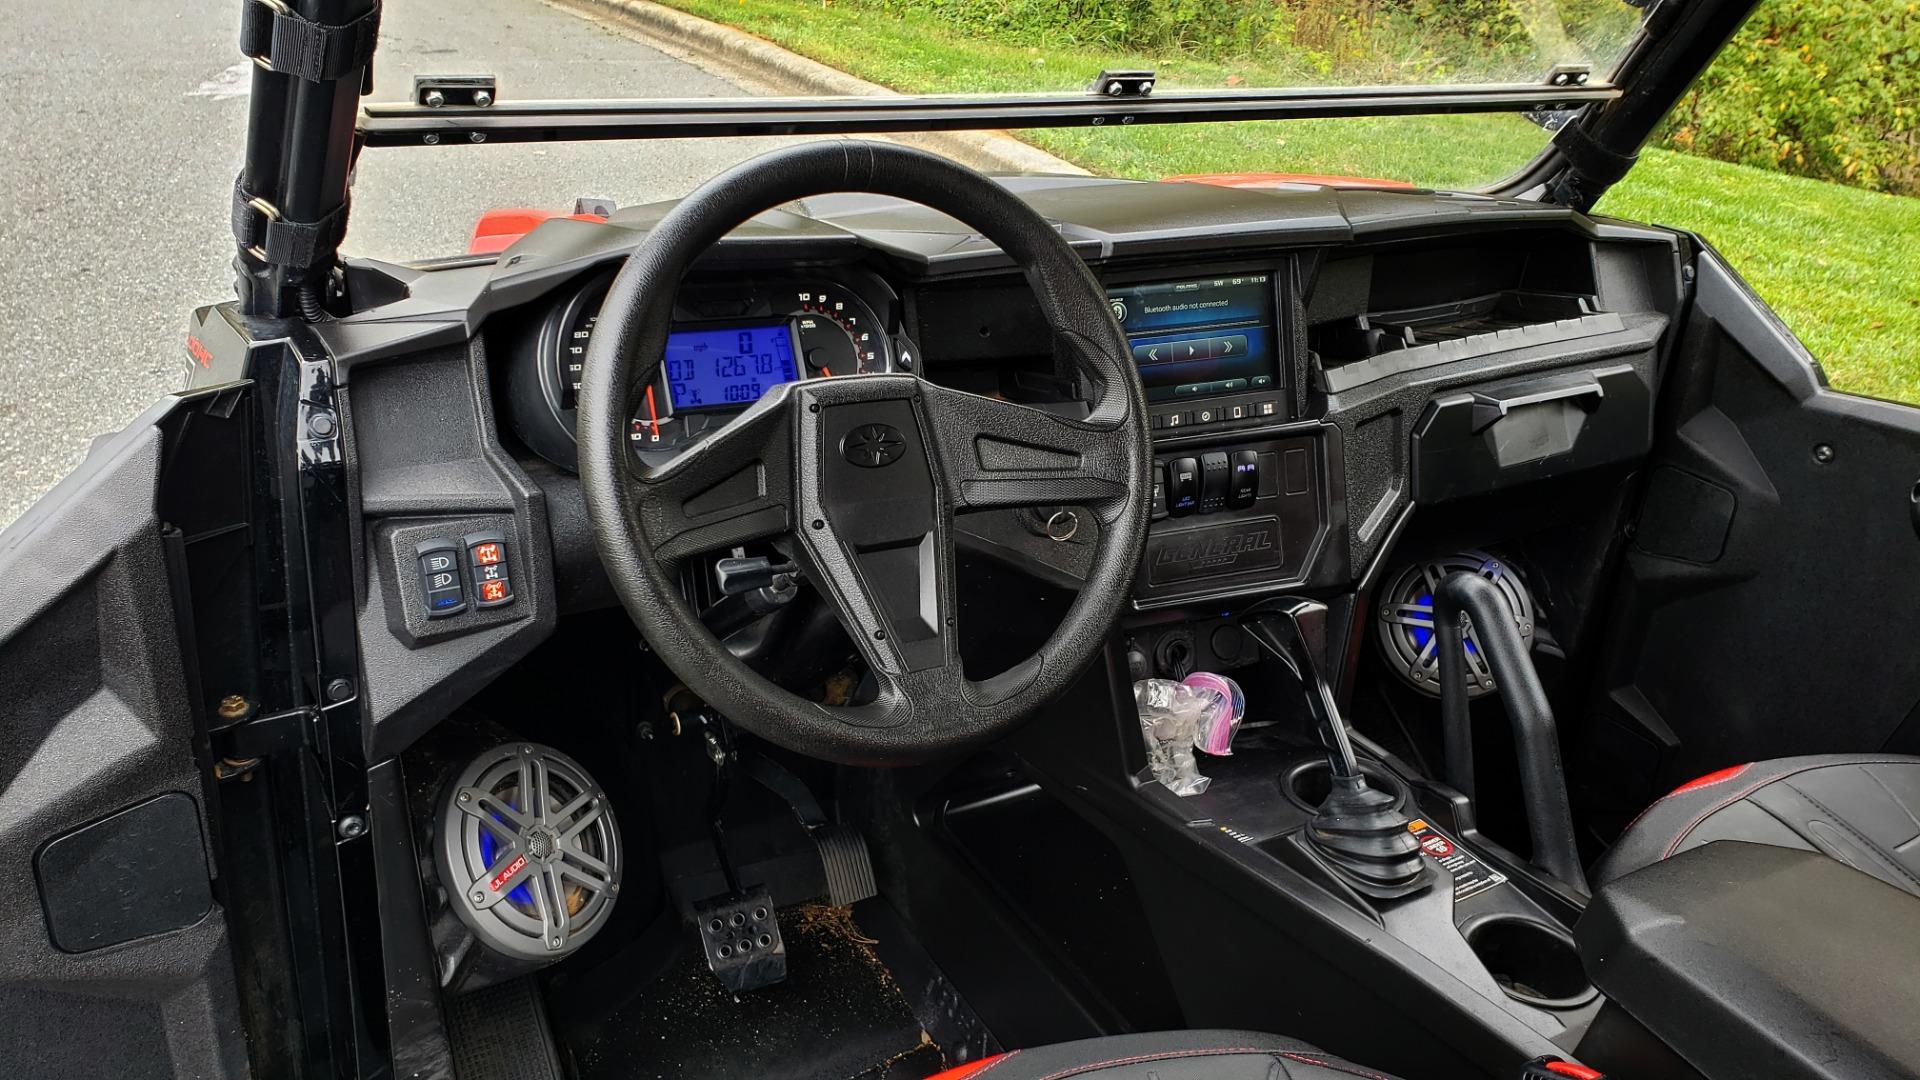 Used 2018 Polaris GENERAL 4 1000 EPS / 4-SEATER / TILT BED / LED LIGHT BARS / BACK-UP CAMERA for sale Sold at Formula Imports in Charlotte NC 28227 20